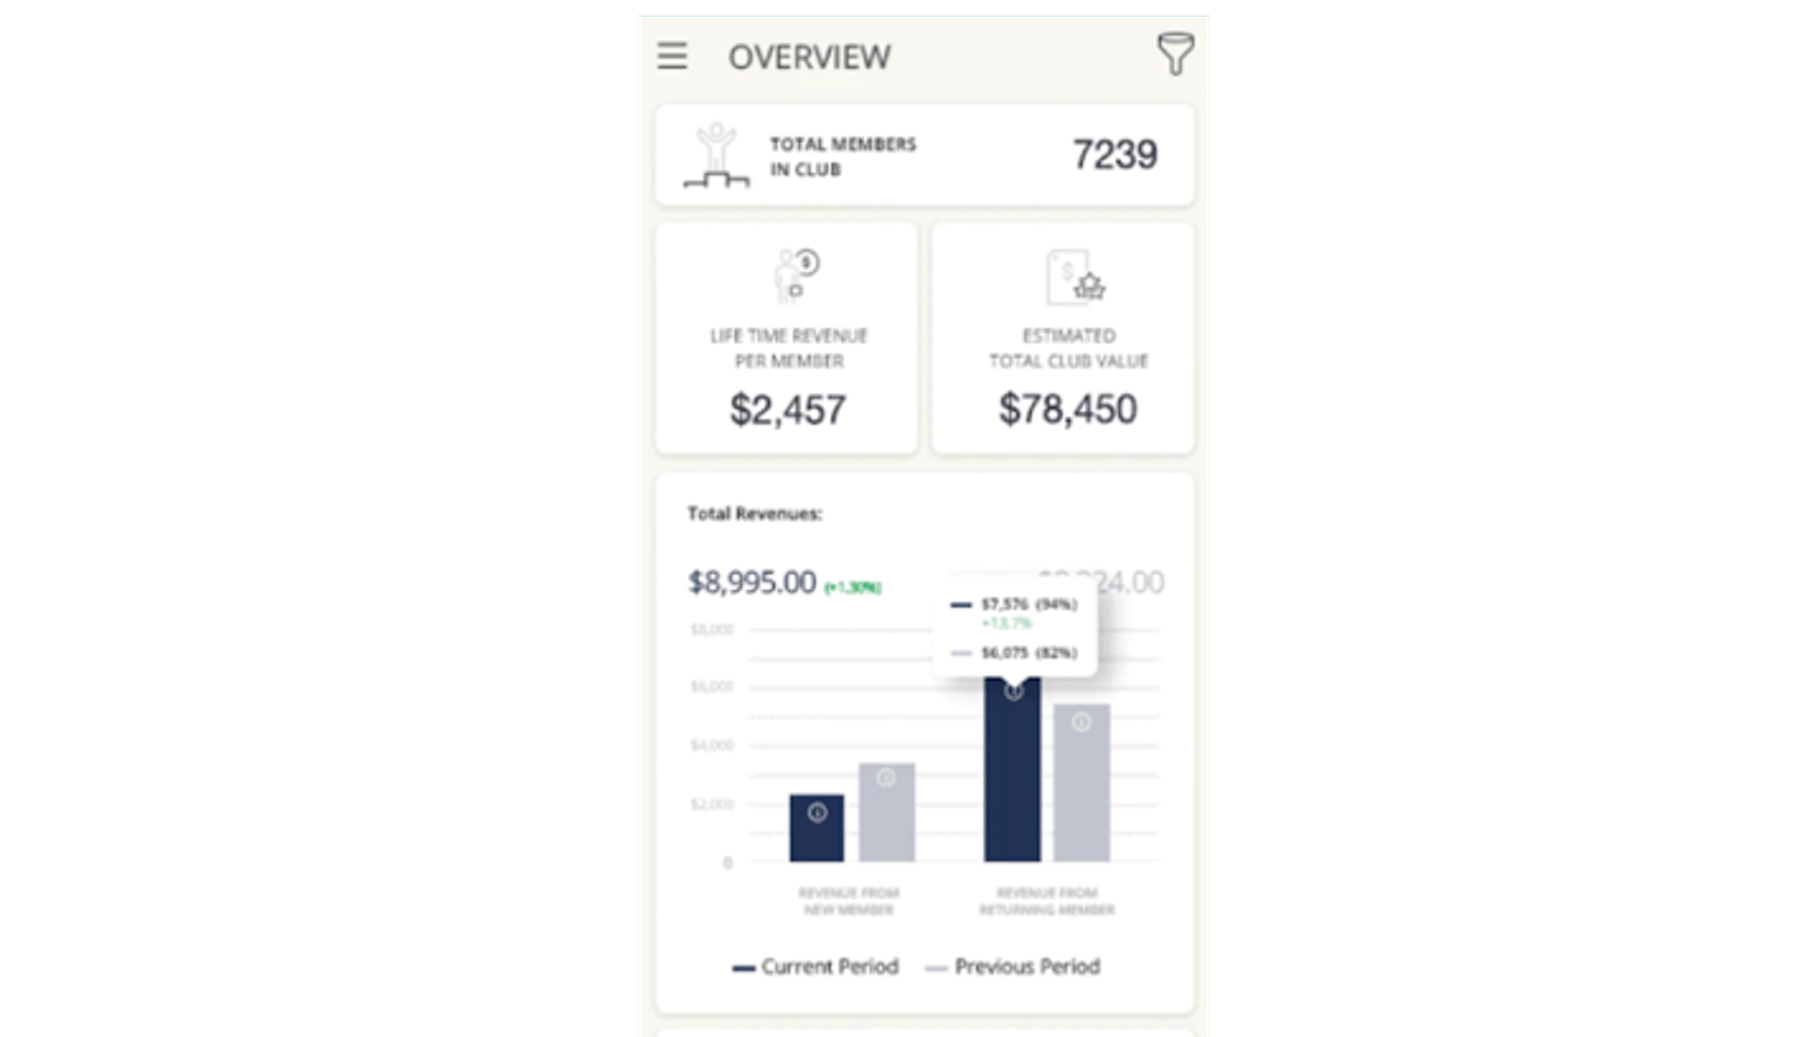 revenue overview